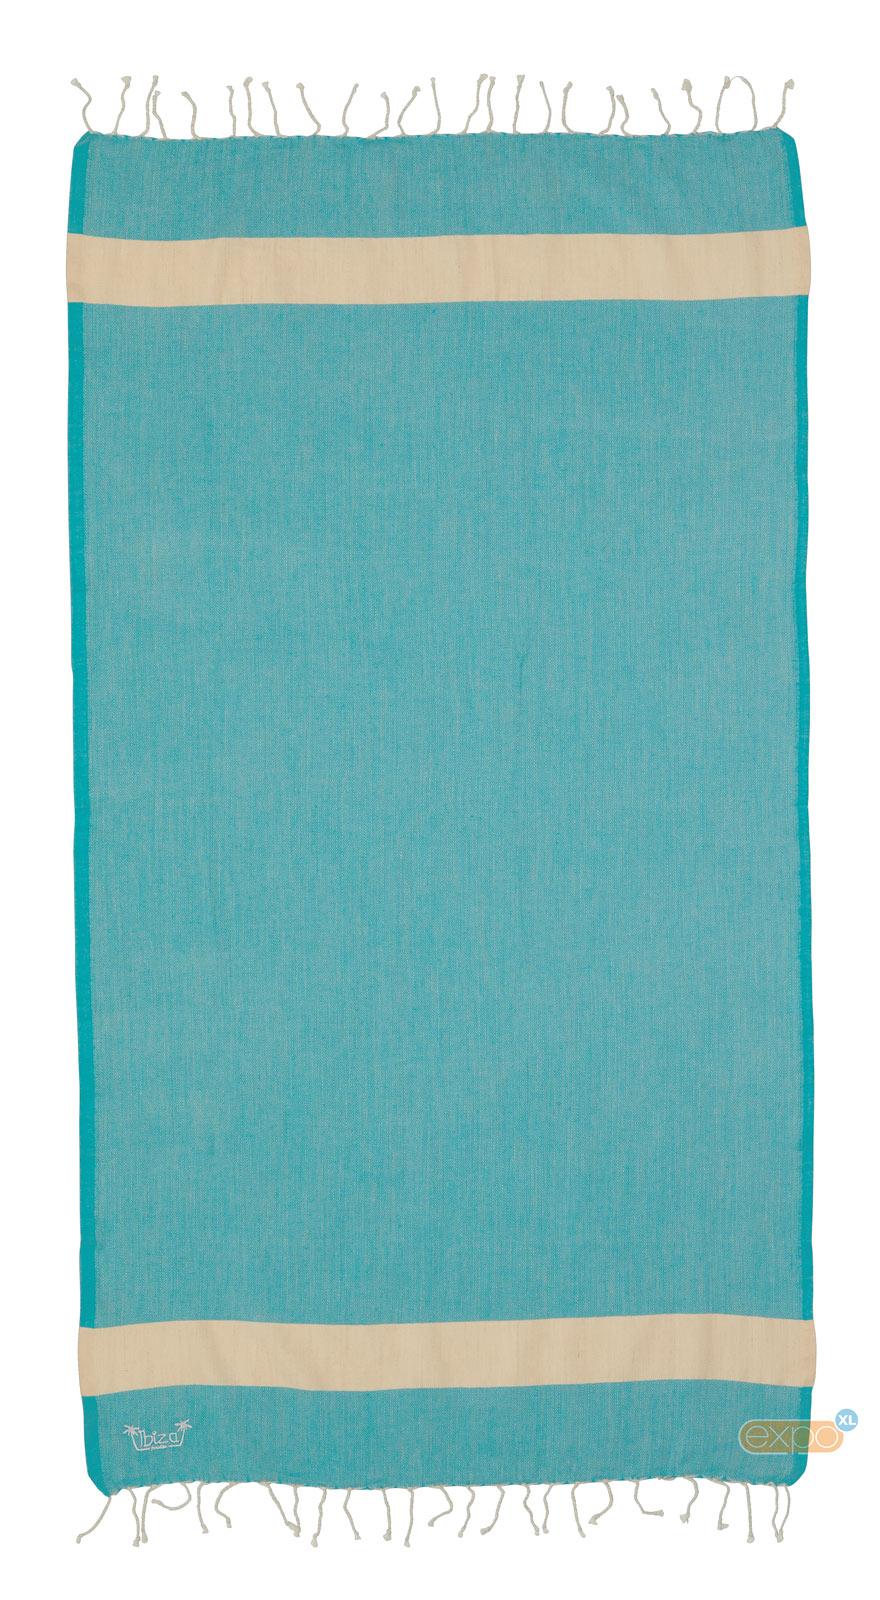 Expo XL Fouta Es Cubellis - XL hamamdoek - blauw